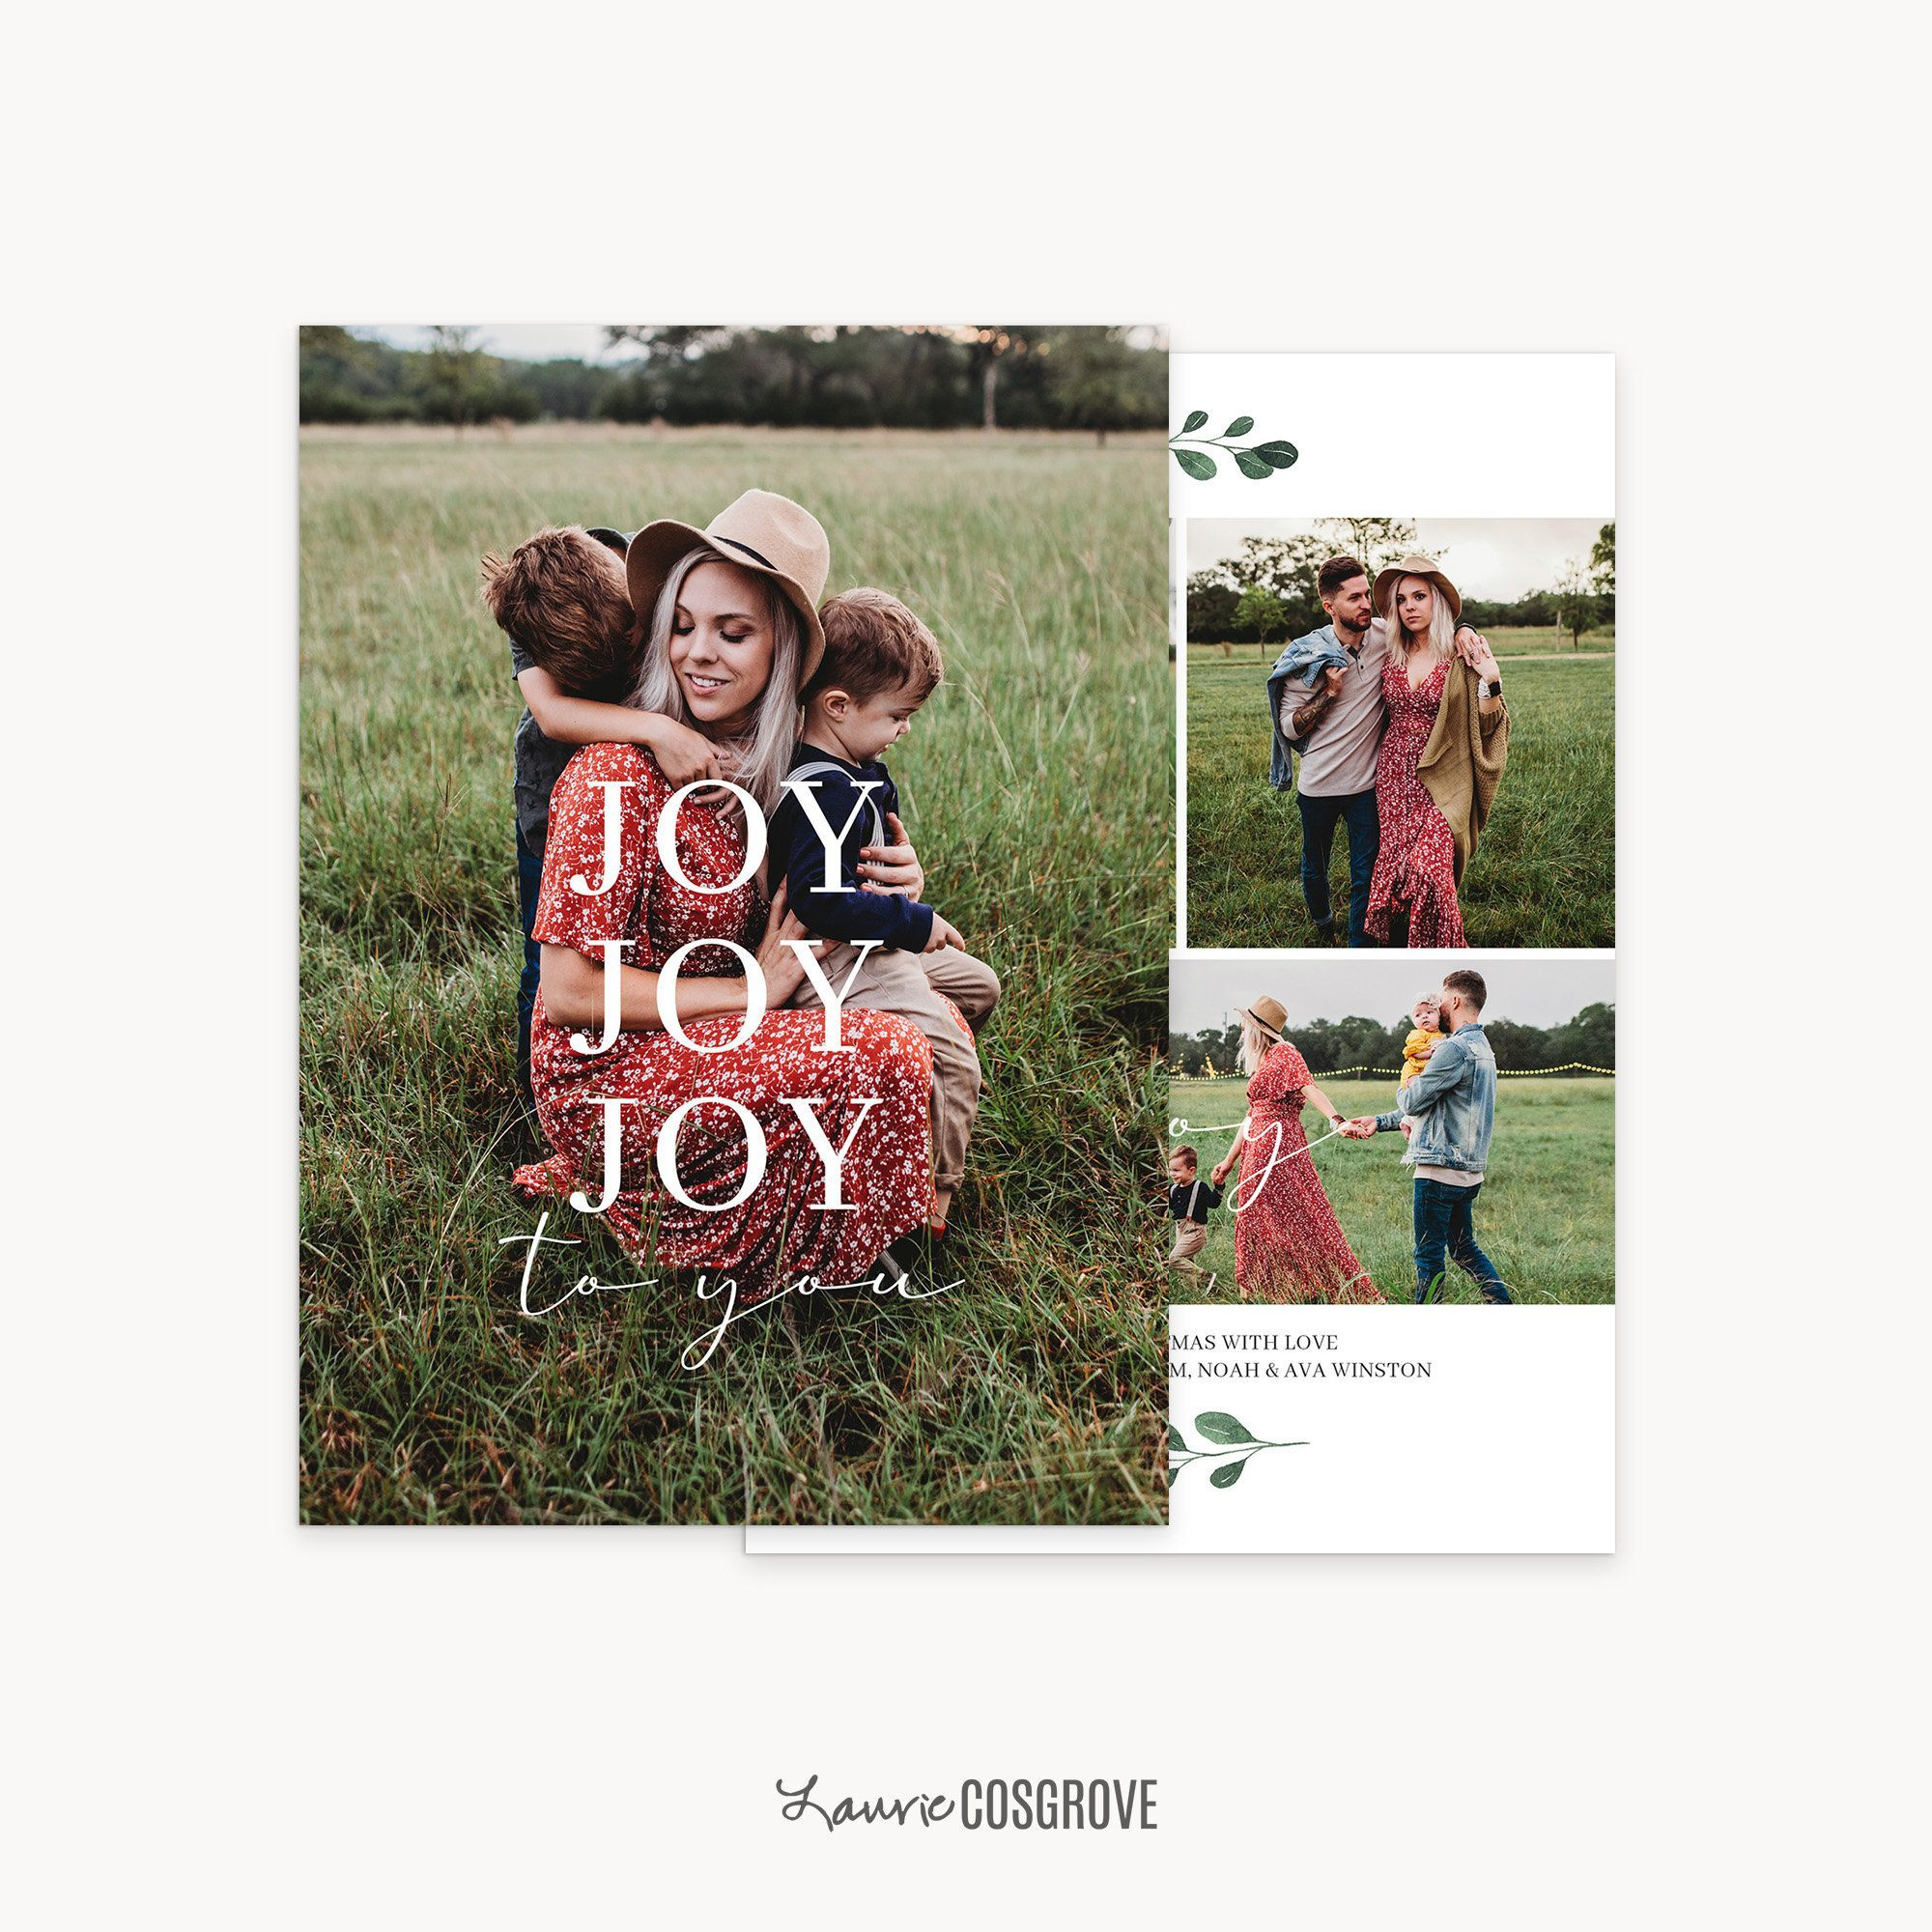 2020 Christmas Card Template 5x7 Holiday Card Template For Etsy Holiday Card Template Christmas Card Template Card Template